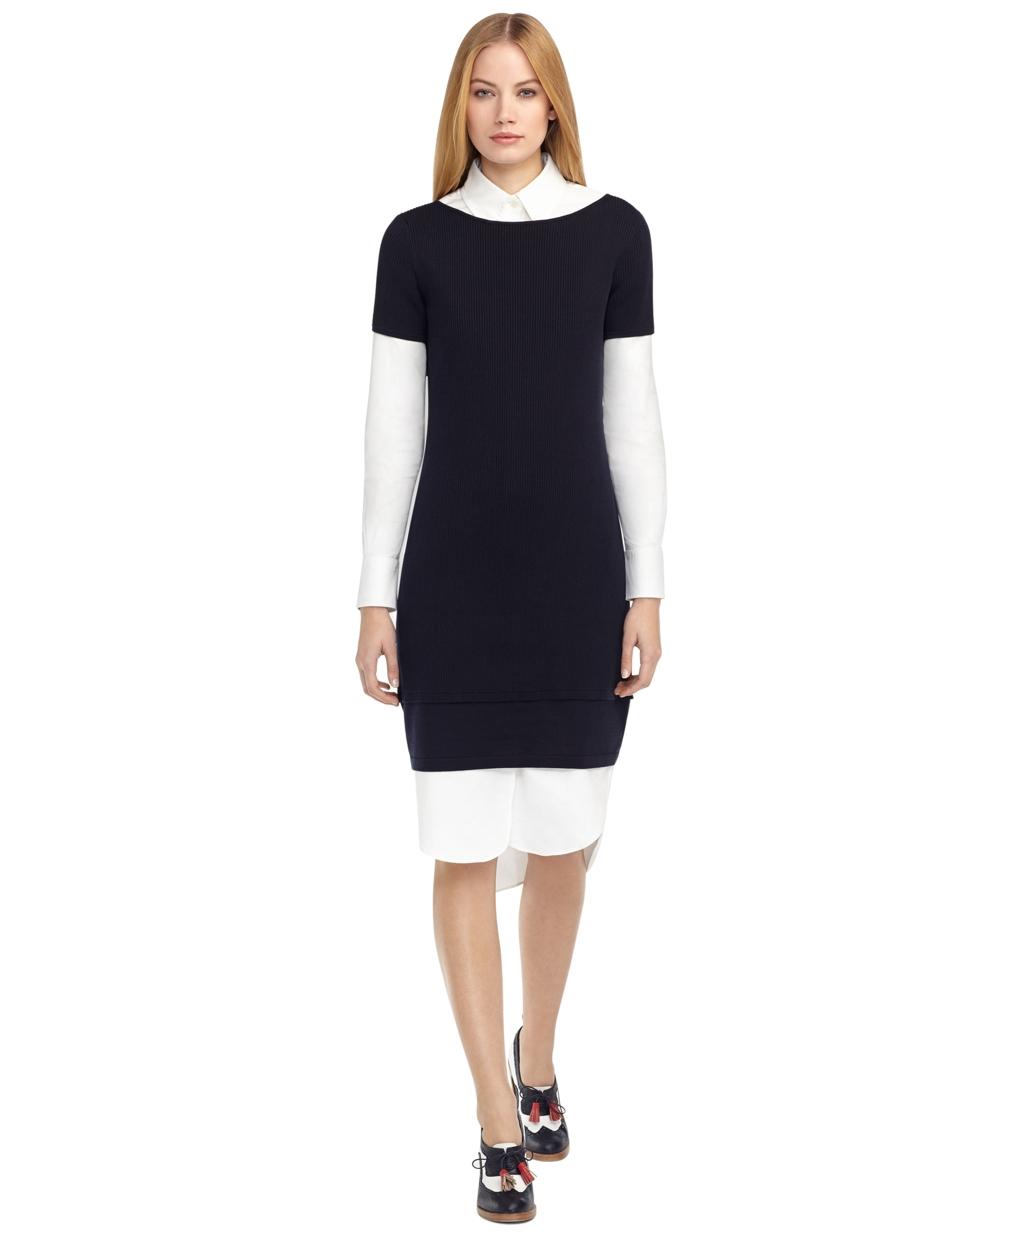 Women's Black Fleece Ribbed Dress